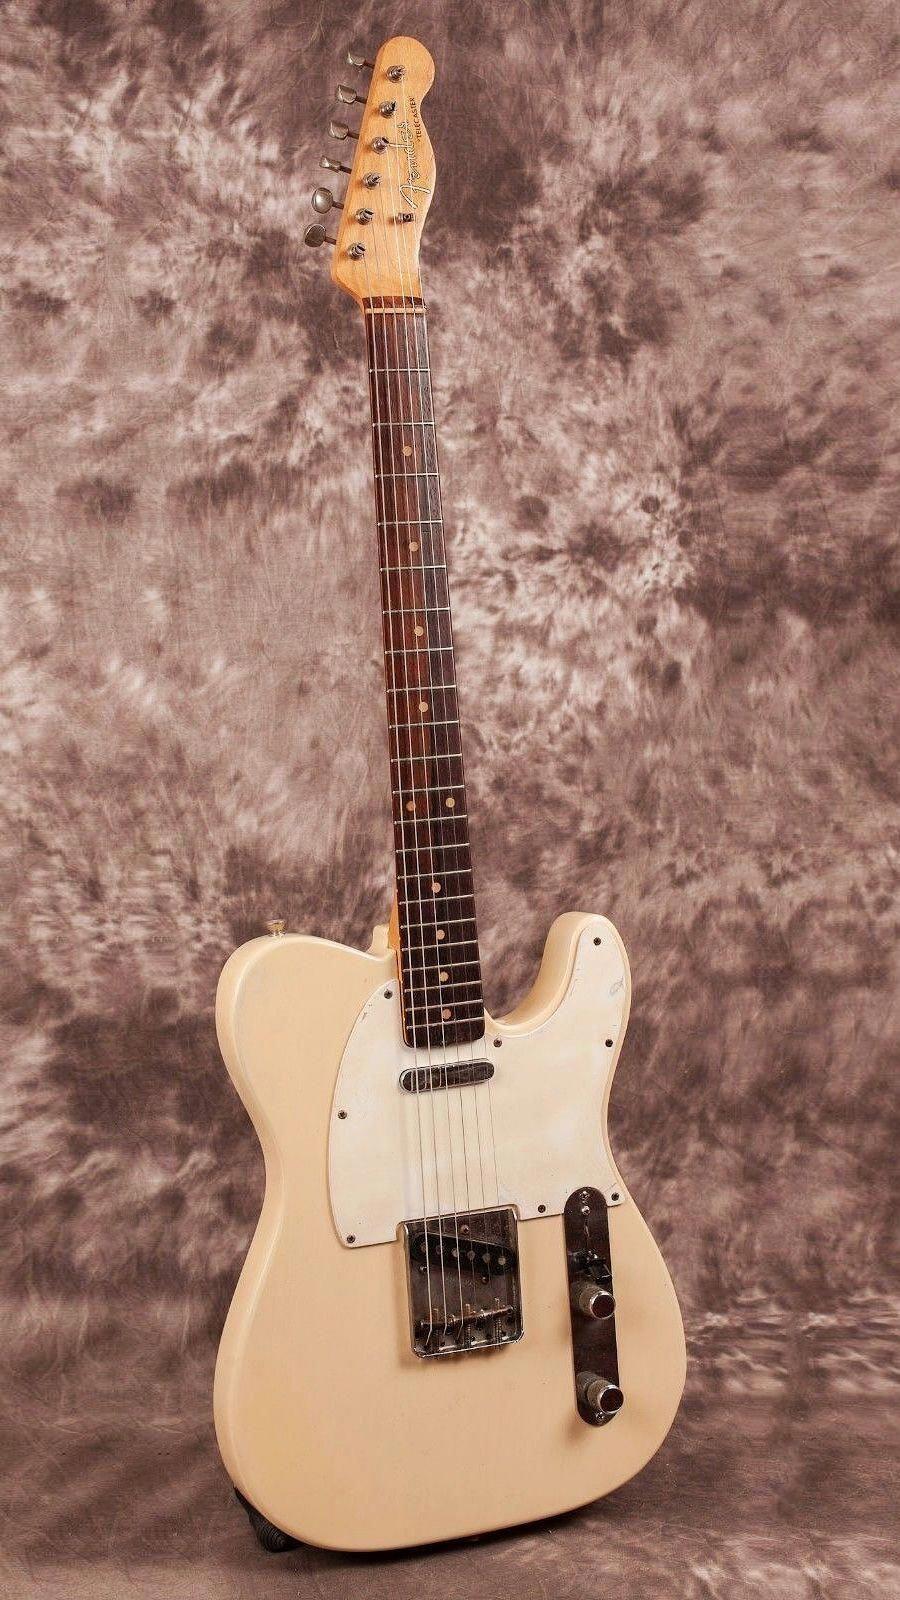 Fender Guitars Acoustic Electric Fender Guitar Amp Cord #guitarspotter #guitarsecret #fenderguitars #fenderguitars